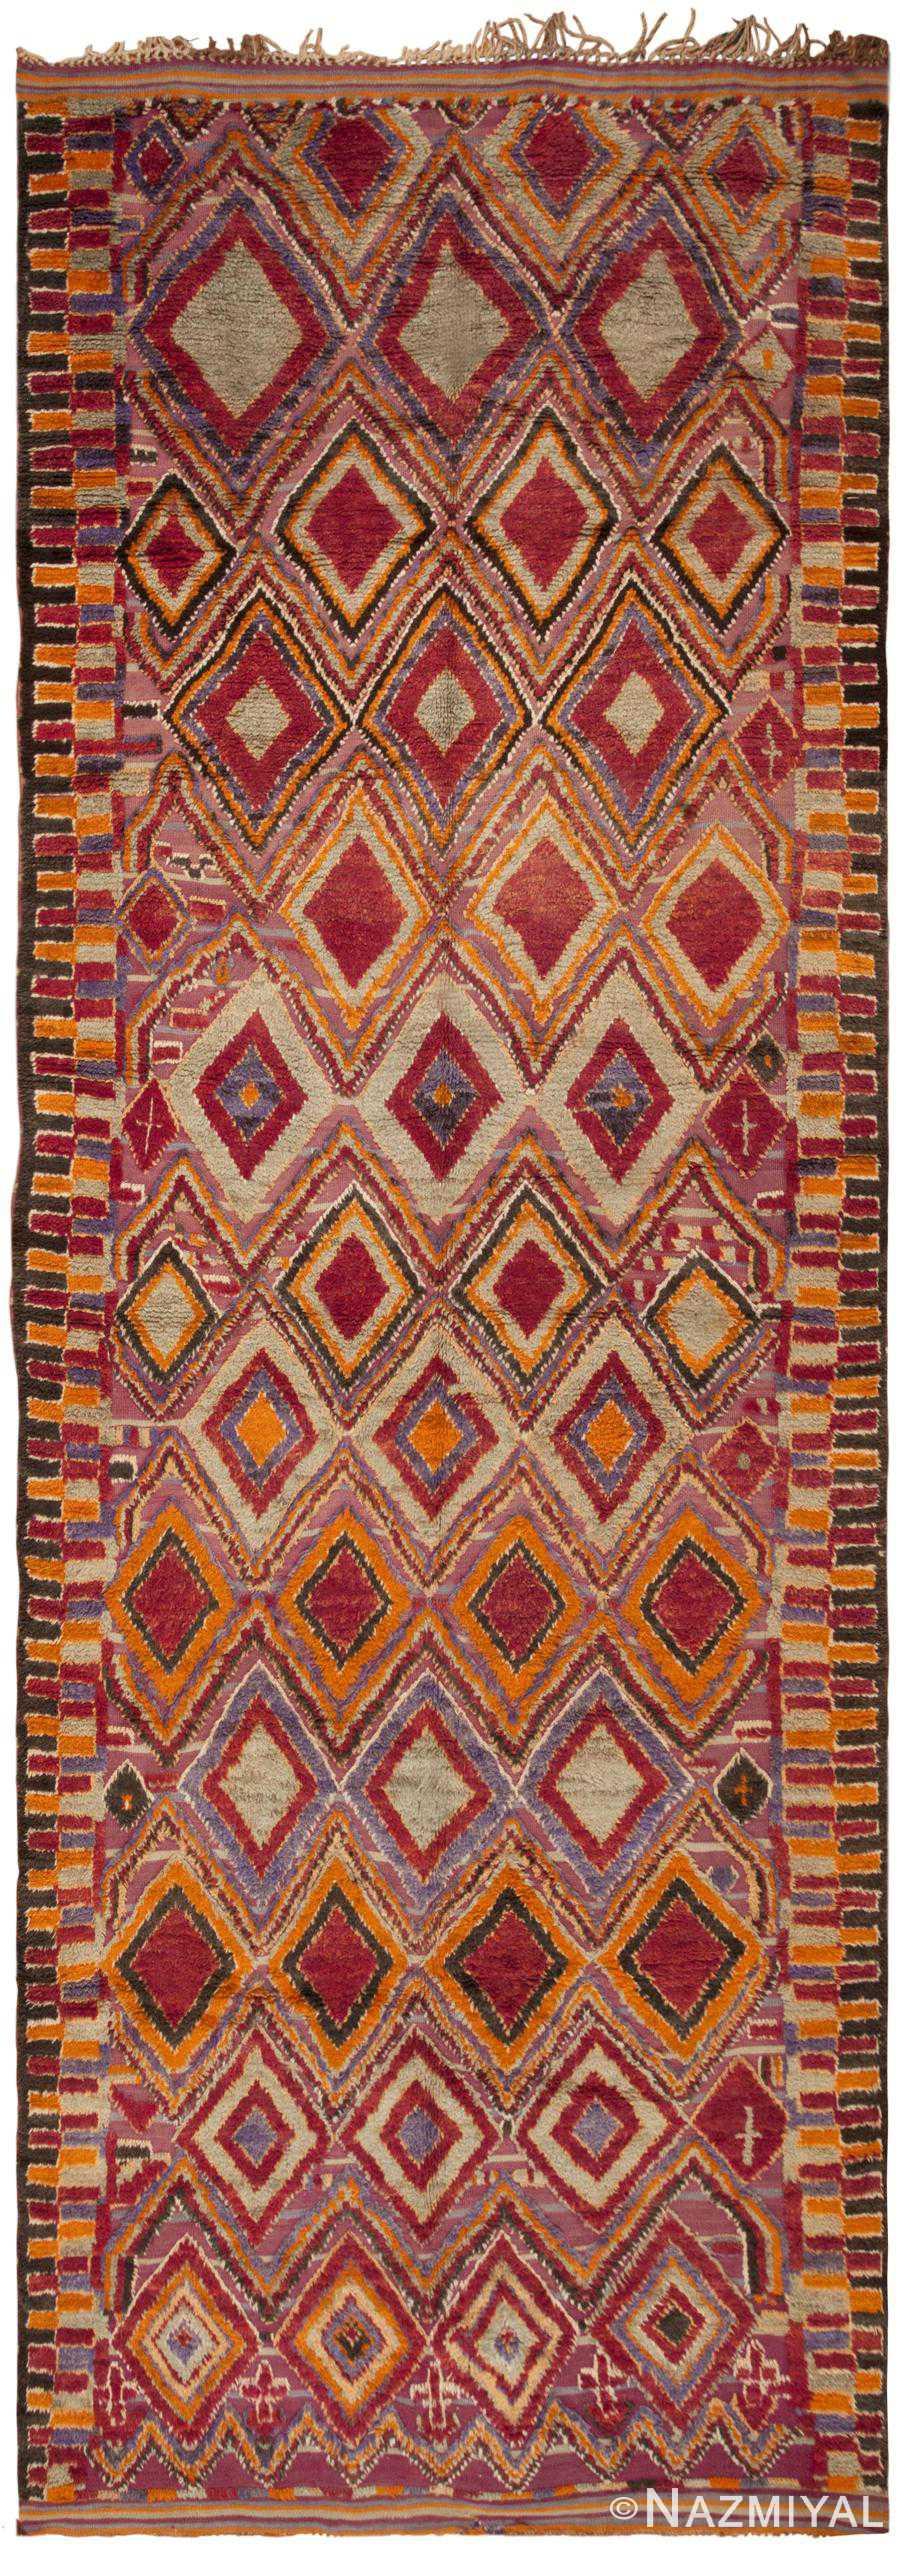 Vintage Moroccan Rug 45996 Large View